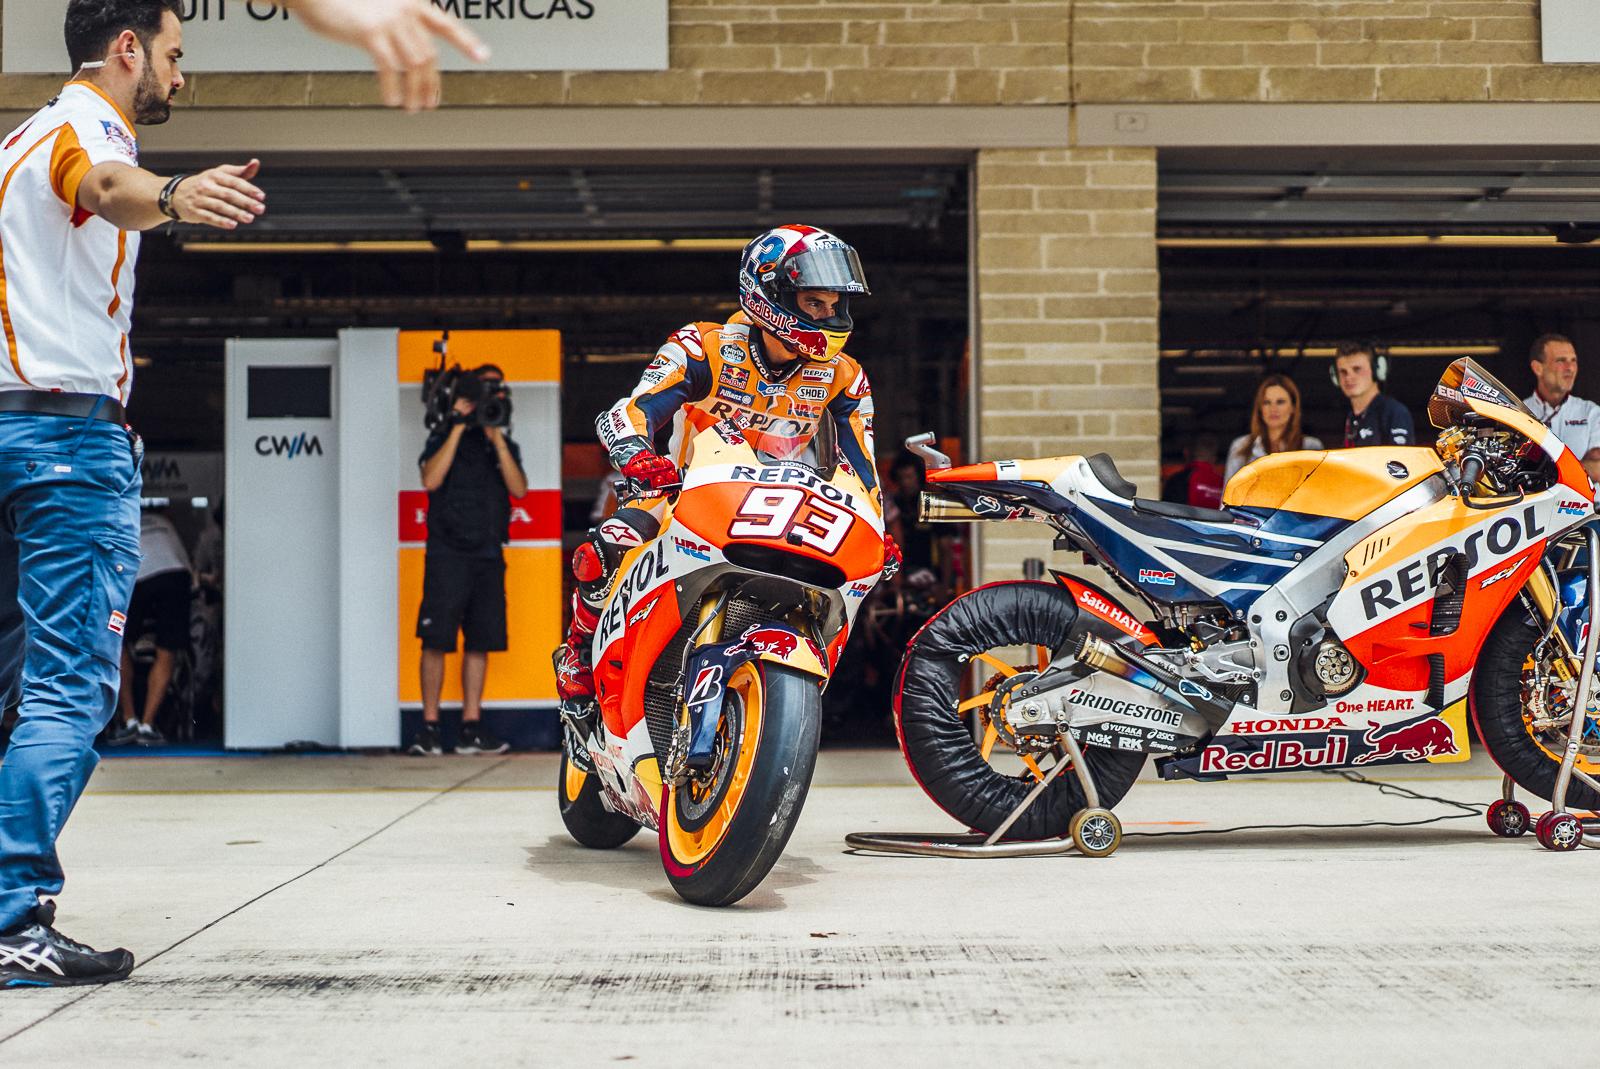 MotoGP-Chad-024.jpg